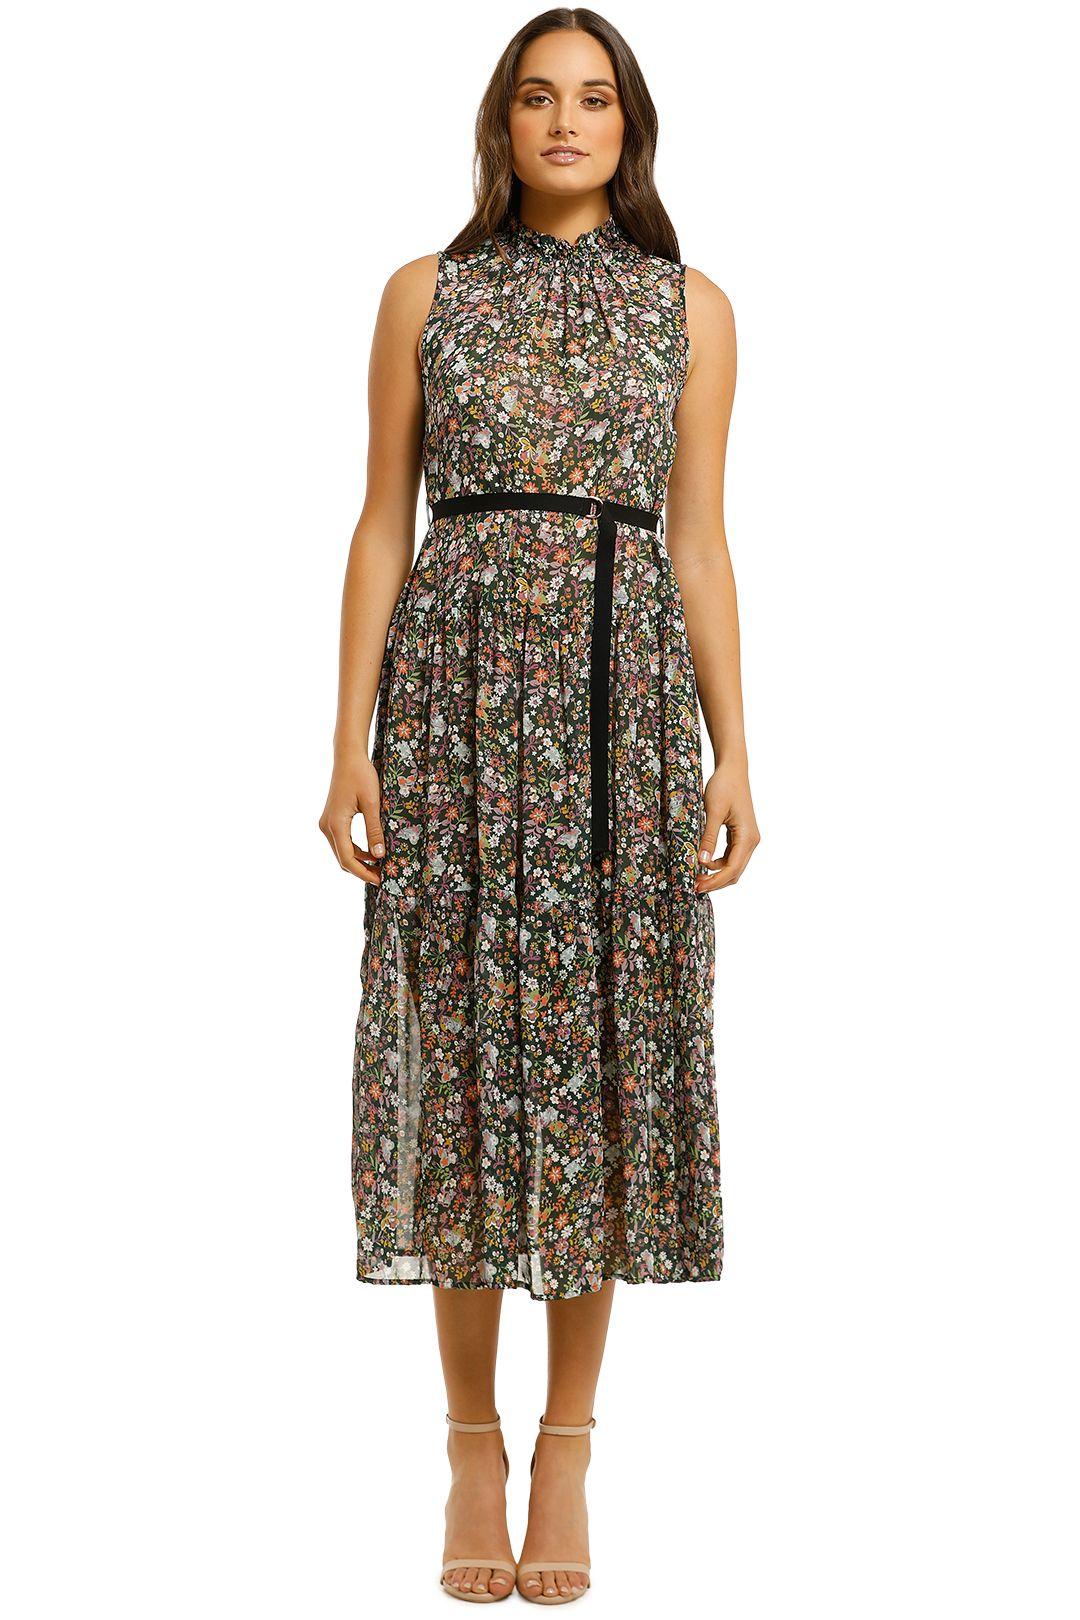 Kate-Sylvester-Birdie-Dress-Floretta-Front